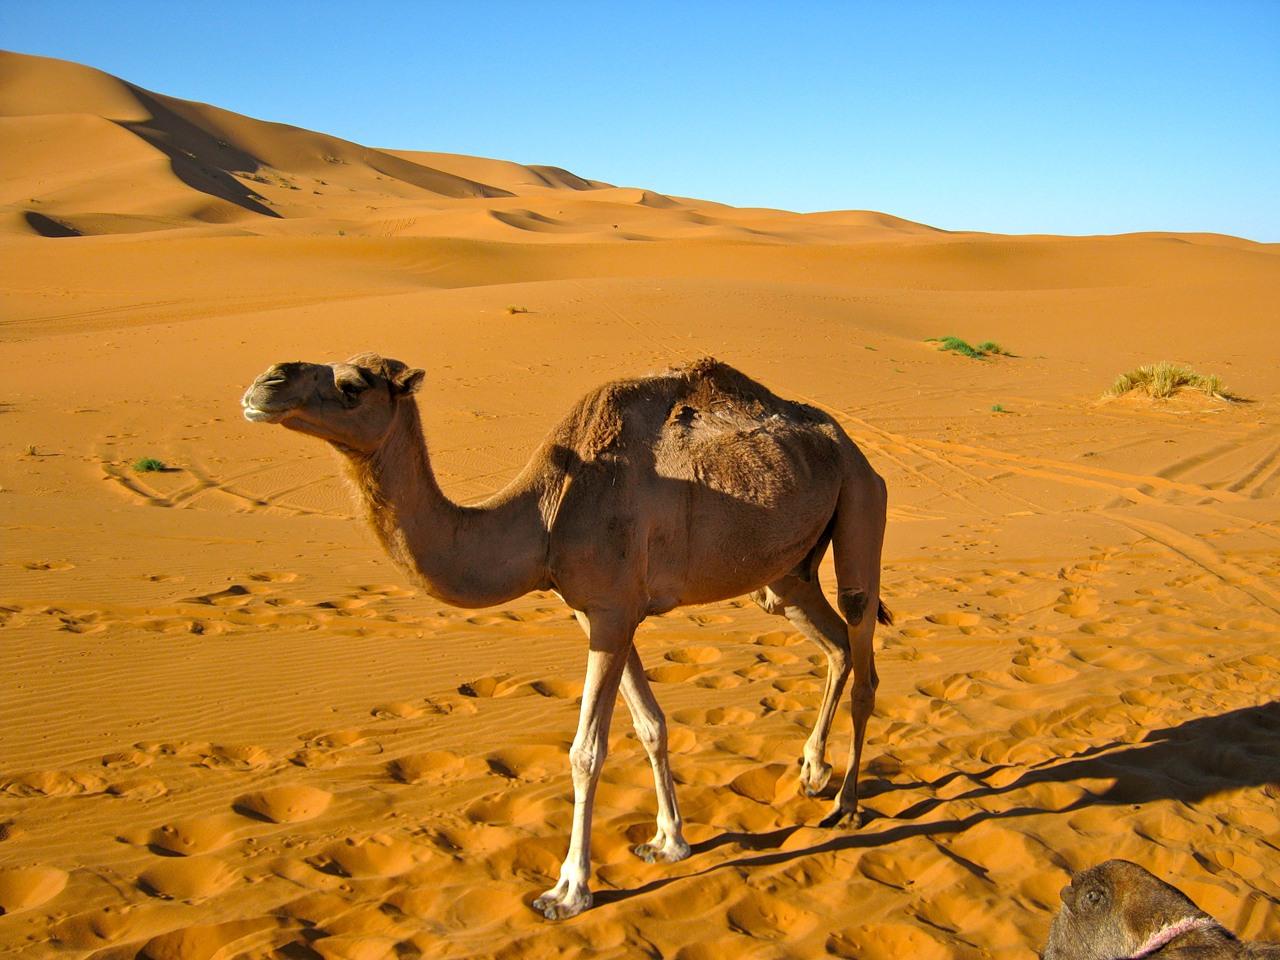 Картинки пустыни и верблюда